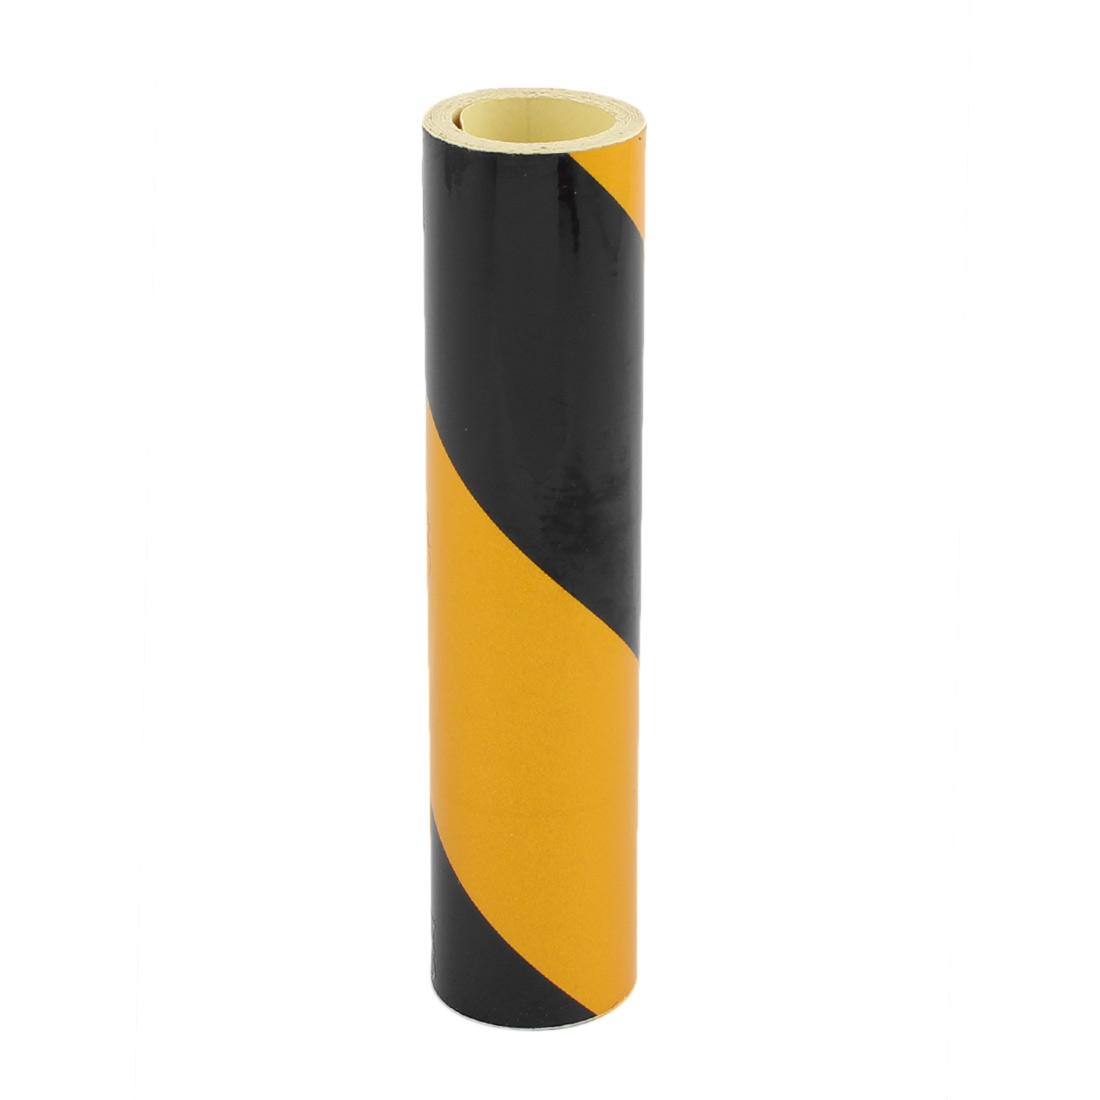 15cm x 2M Single Sided Adhesive Reflective  Warning Tape Tilt Black Yellow - image 2 of 3